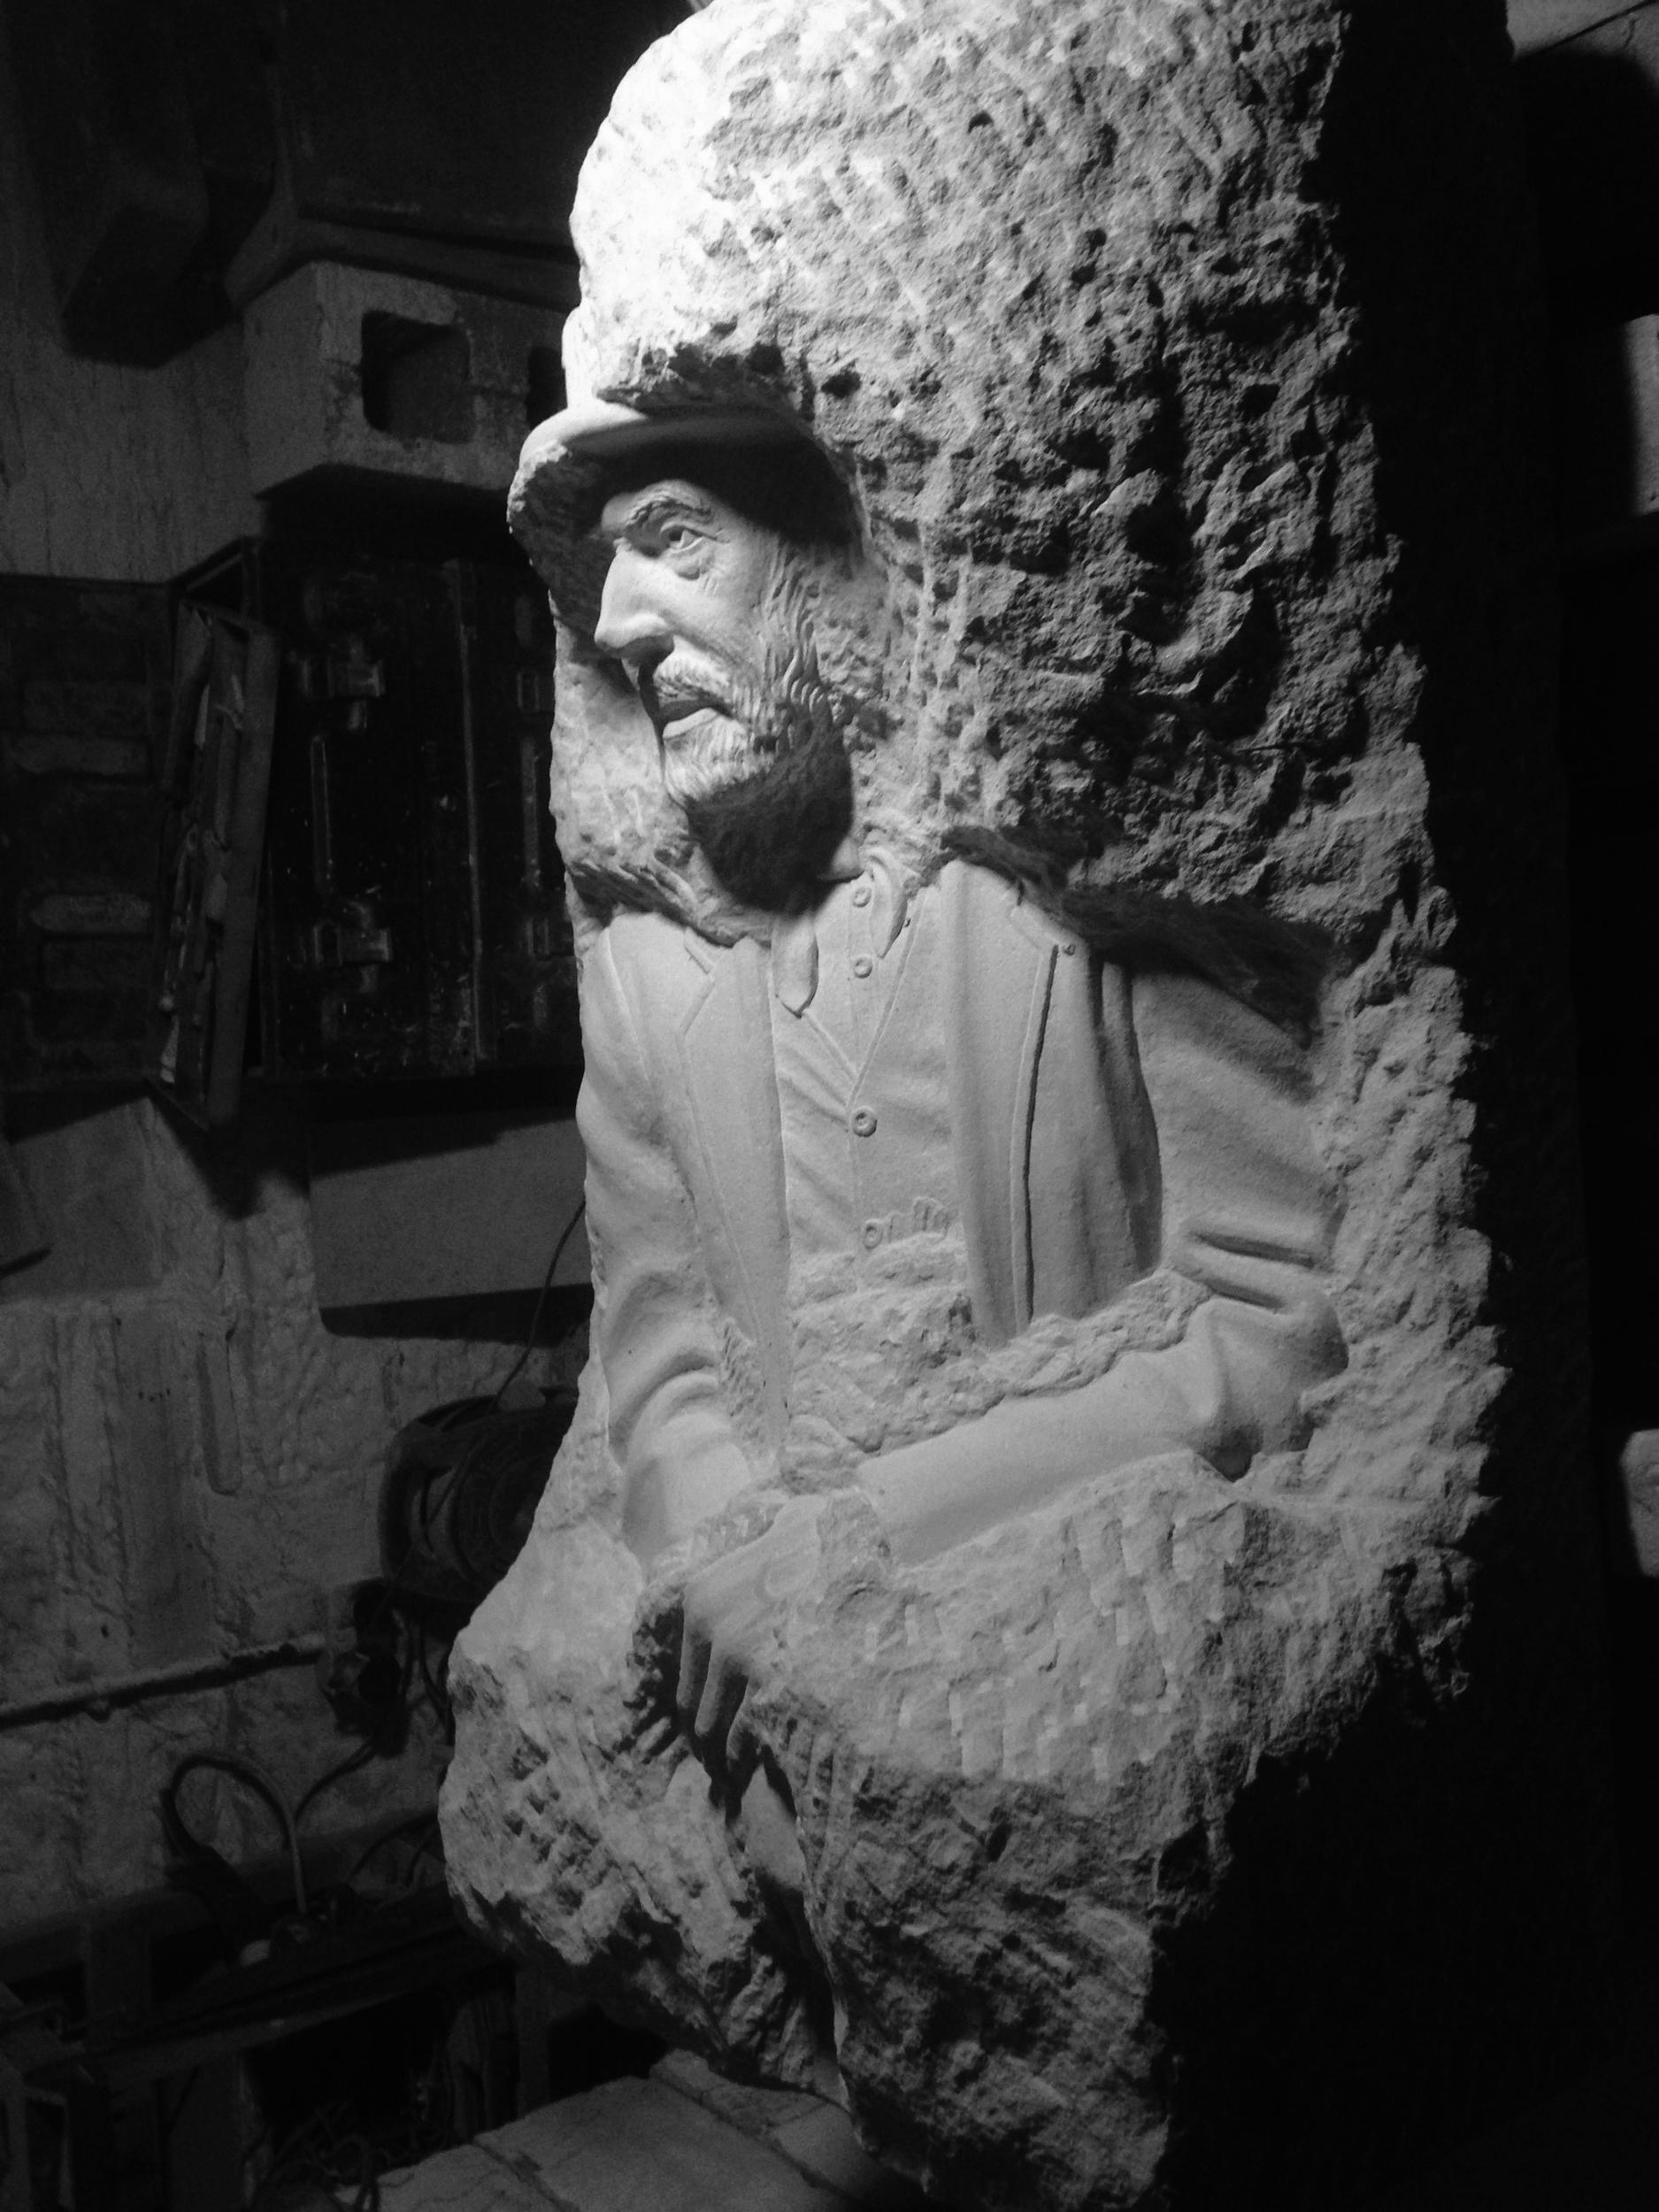 Lead miner in York stone